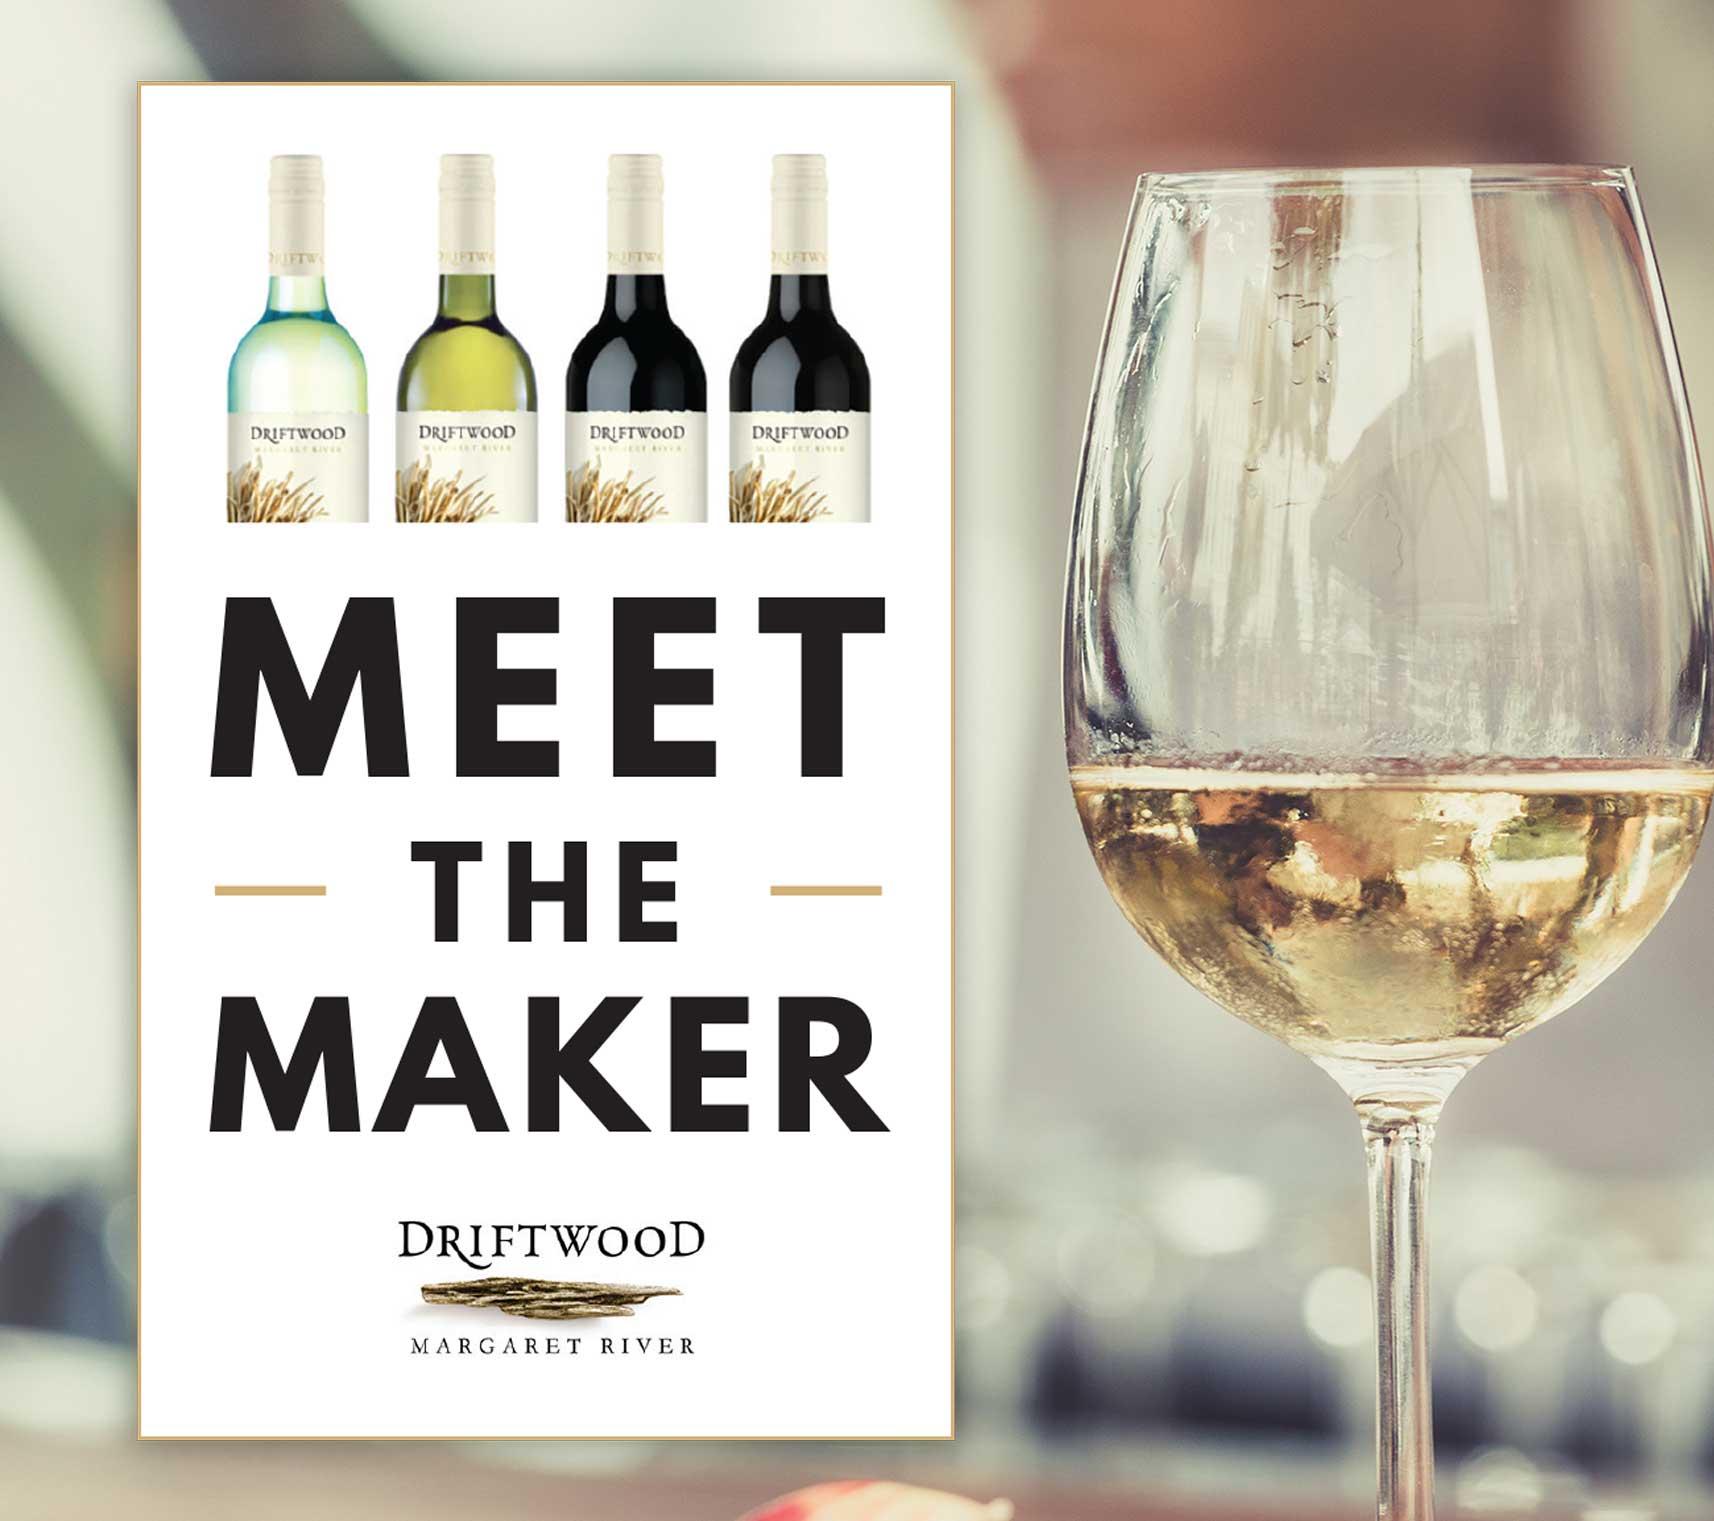 Meet the Maker event image